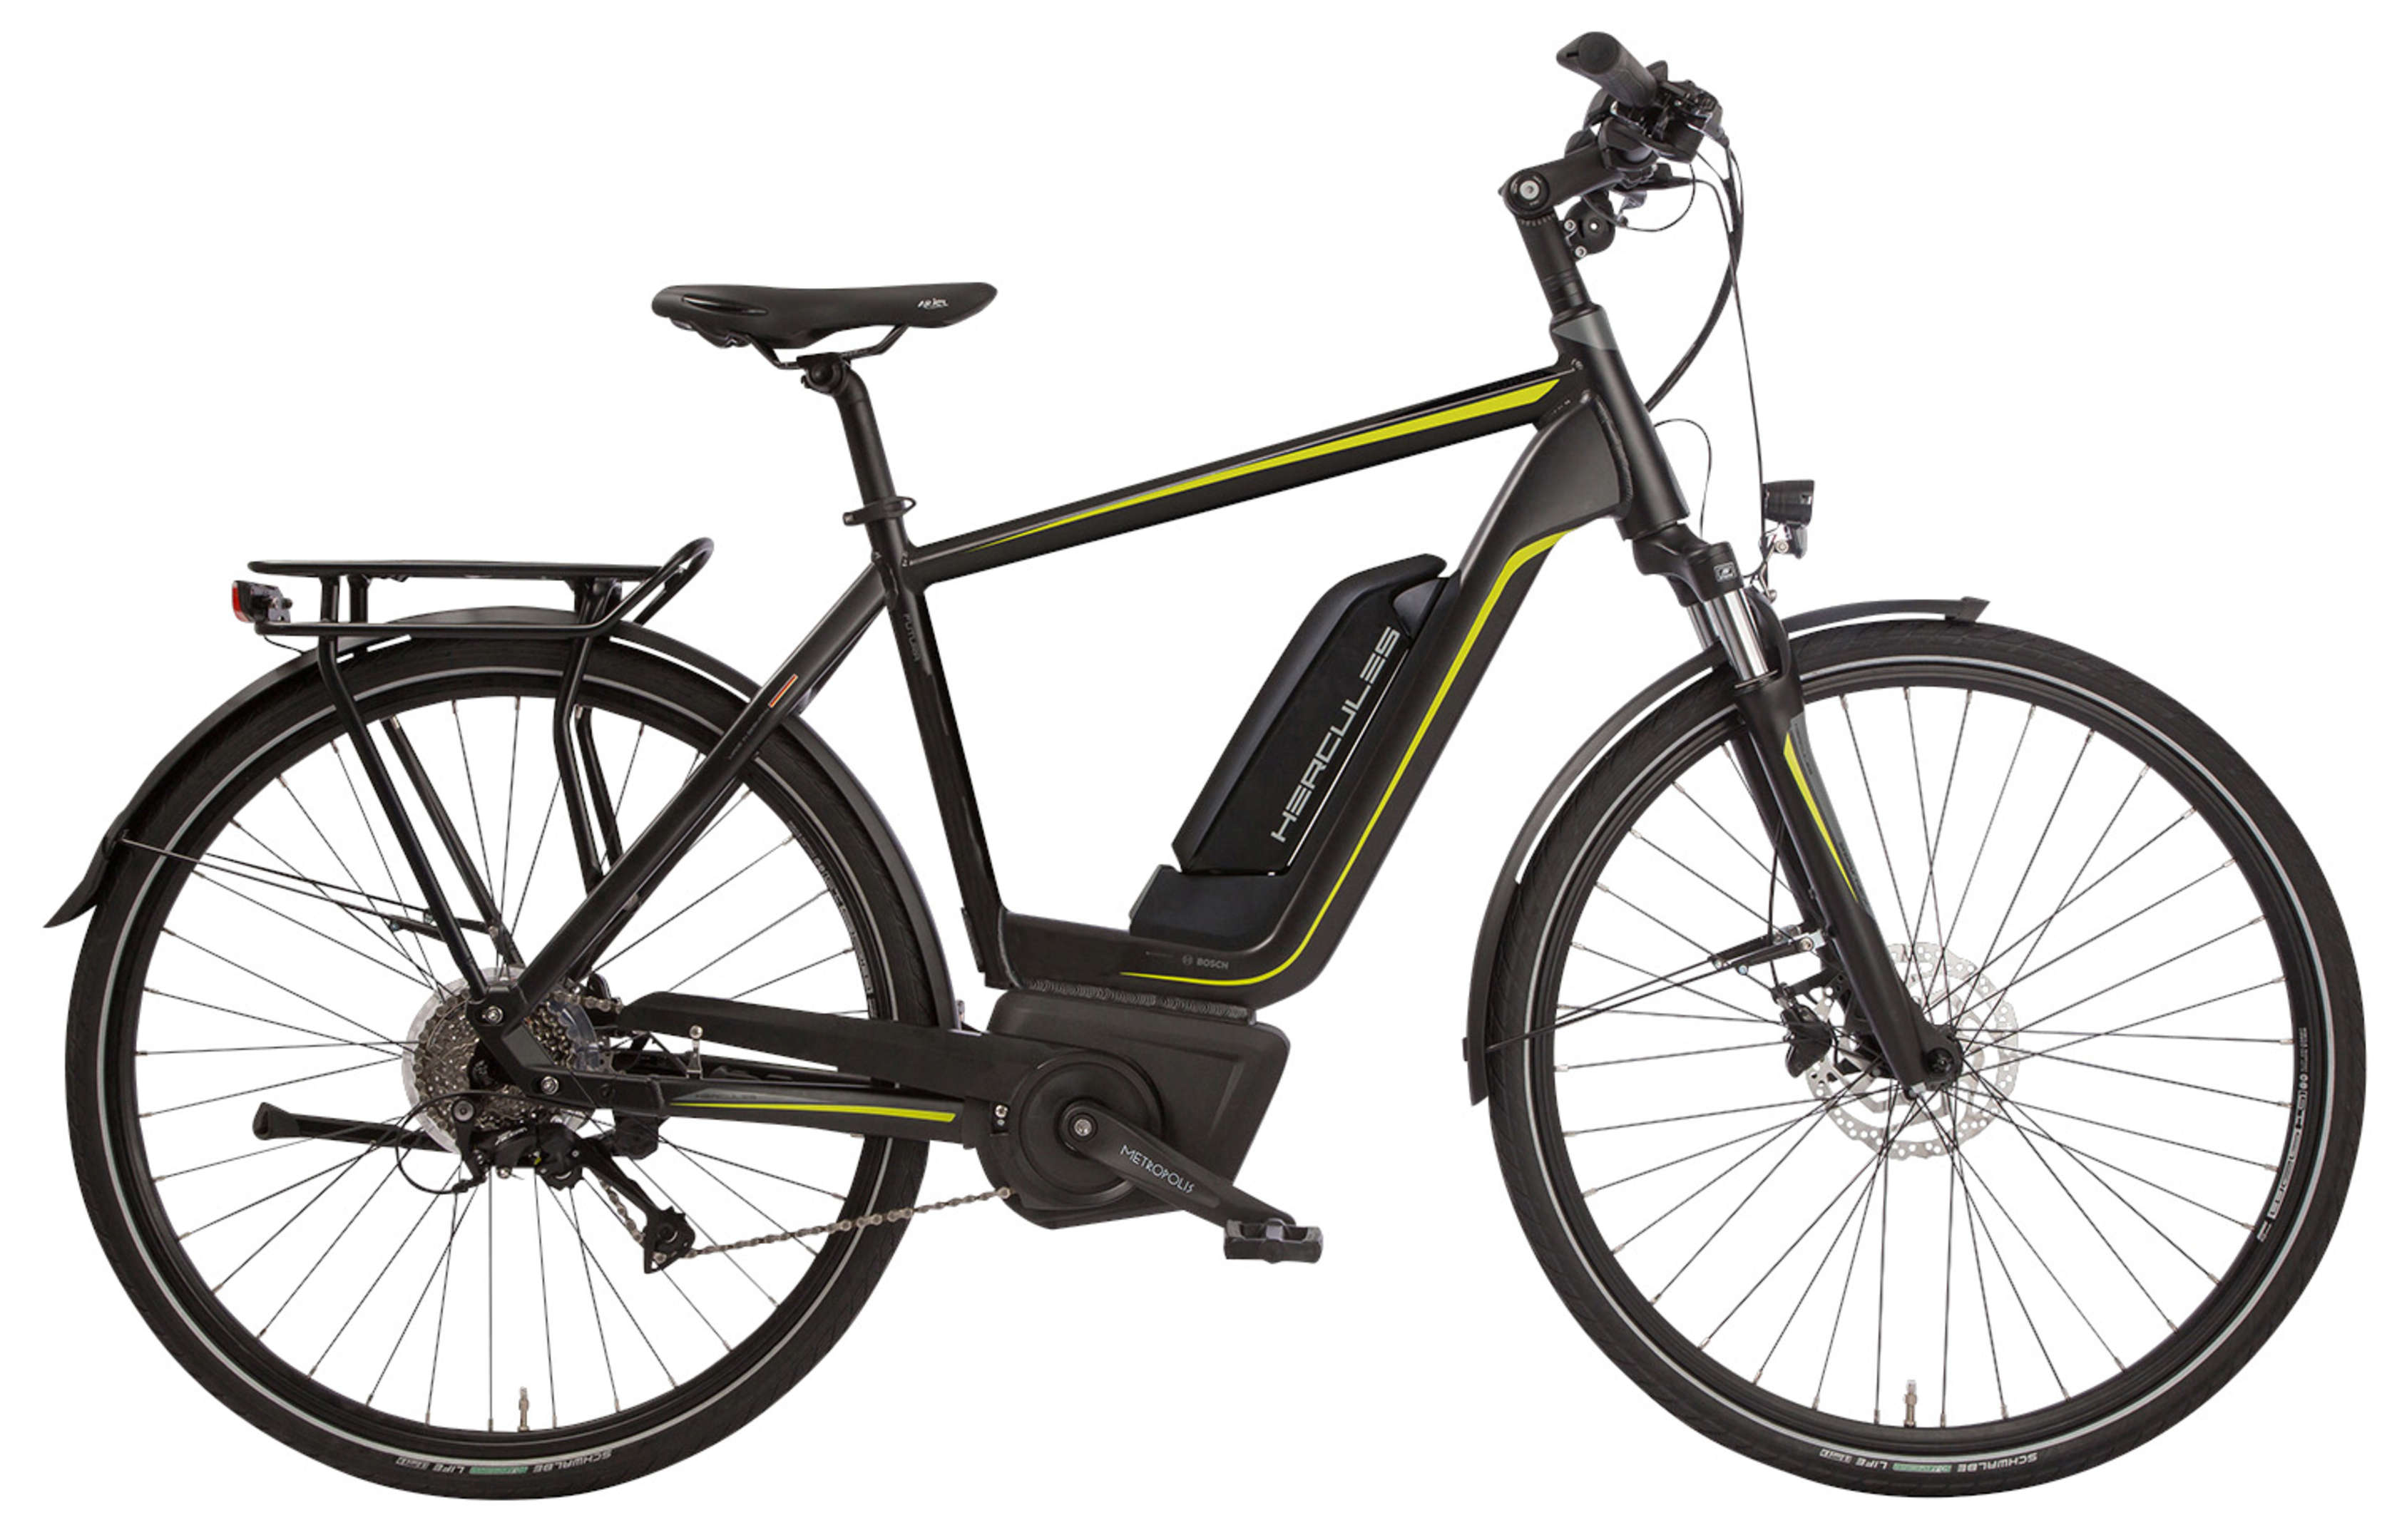 hercules e bike futura 8 eurorad bikeleasingeurorad bikeleasing. Black Bedroom Furniture Sets. Home Design Ideas